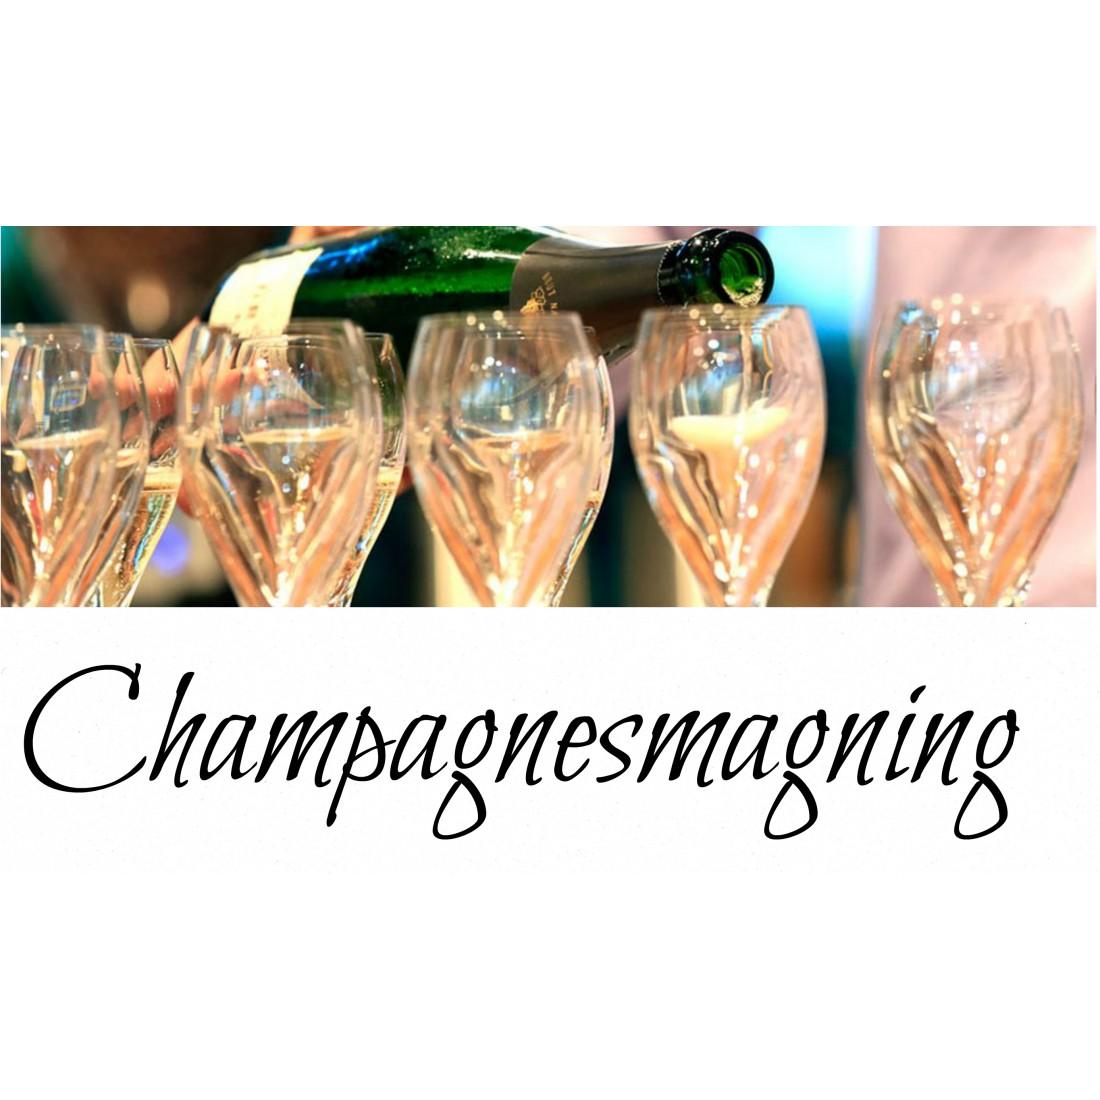 Champagnesmagninglrdagden23oktoberkl1900IChampagneKlderen-31